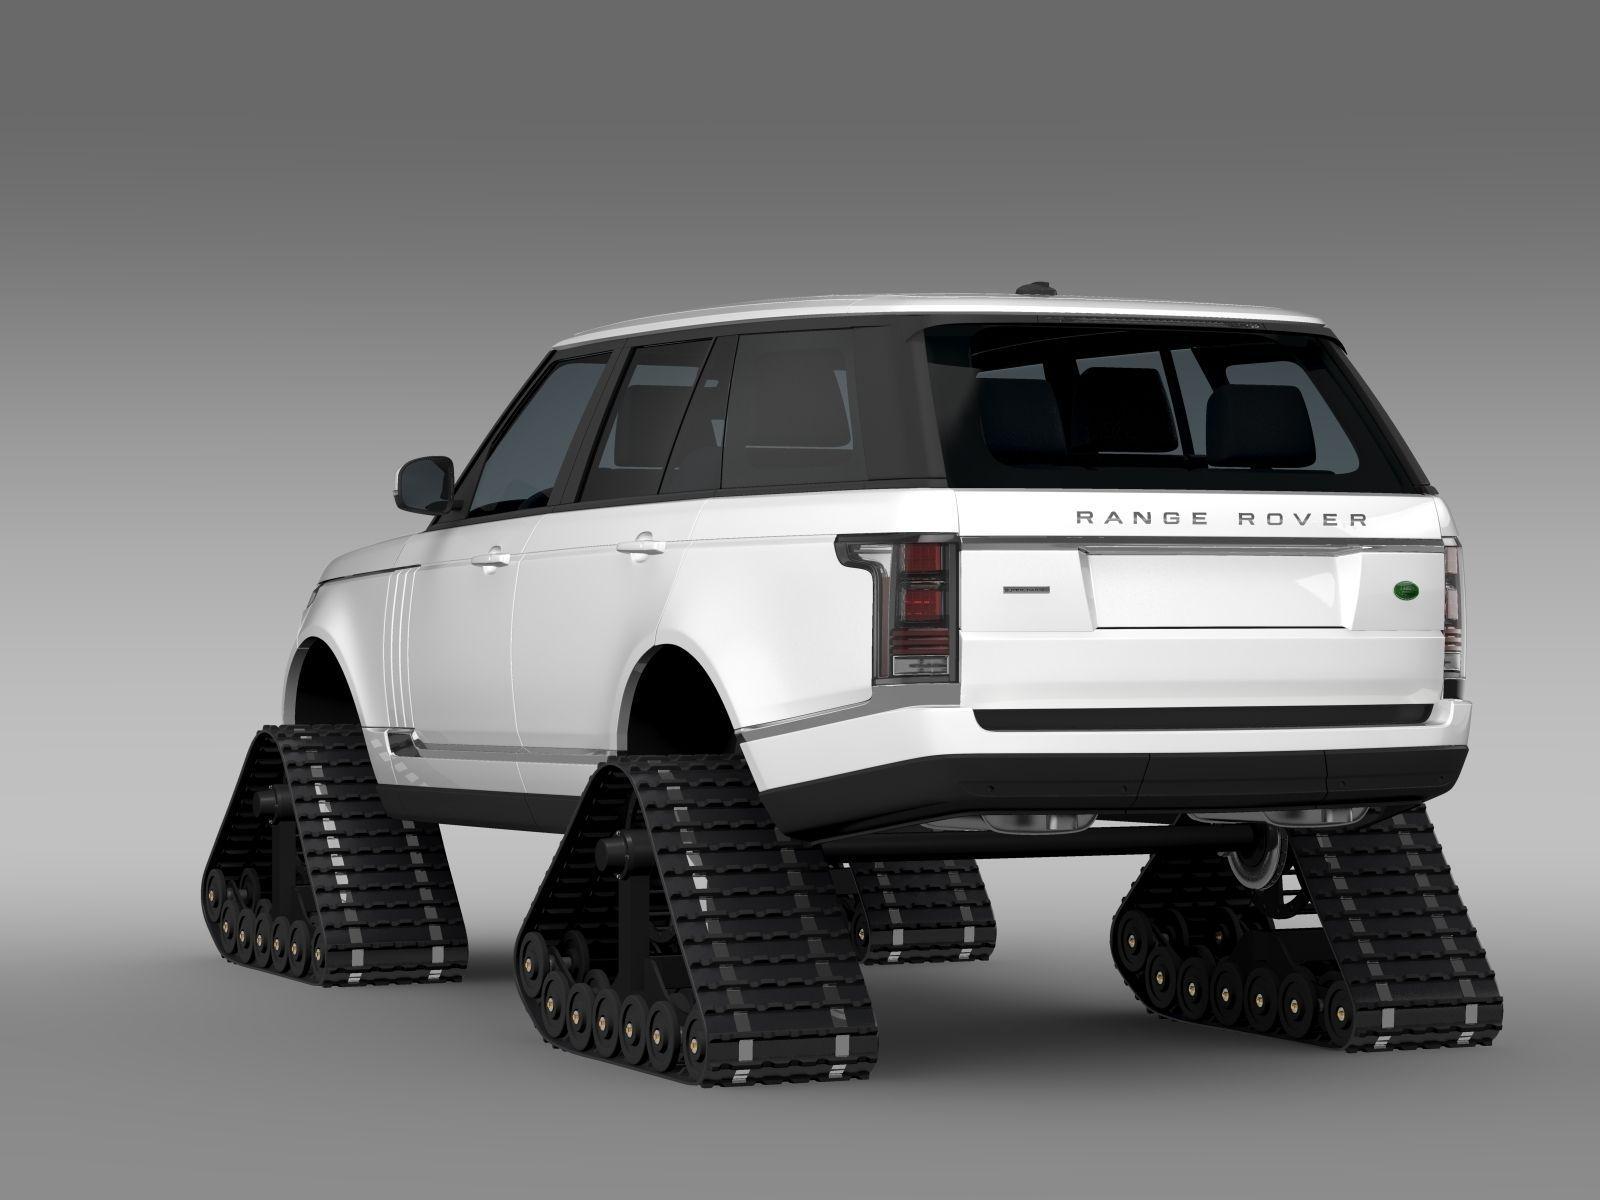 Range Rover Supercharged L405 Crawler 2016 3d Model Max Obj Mtl 3ds